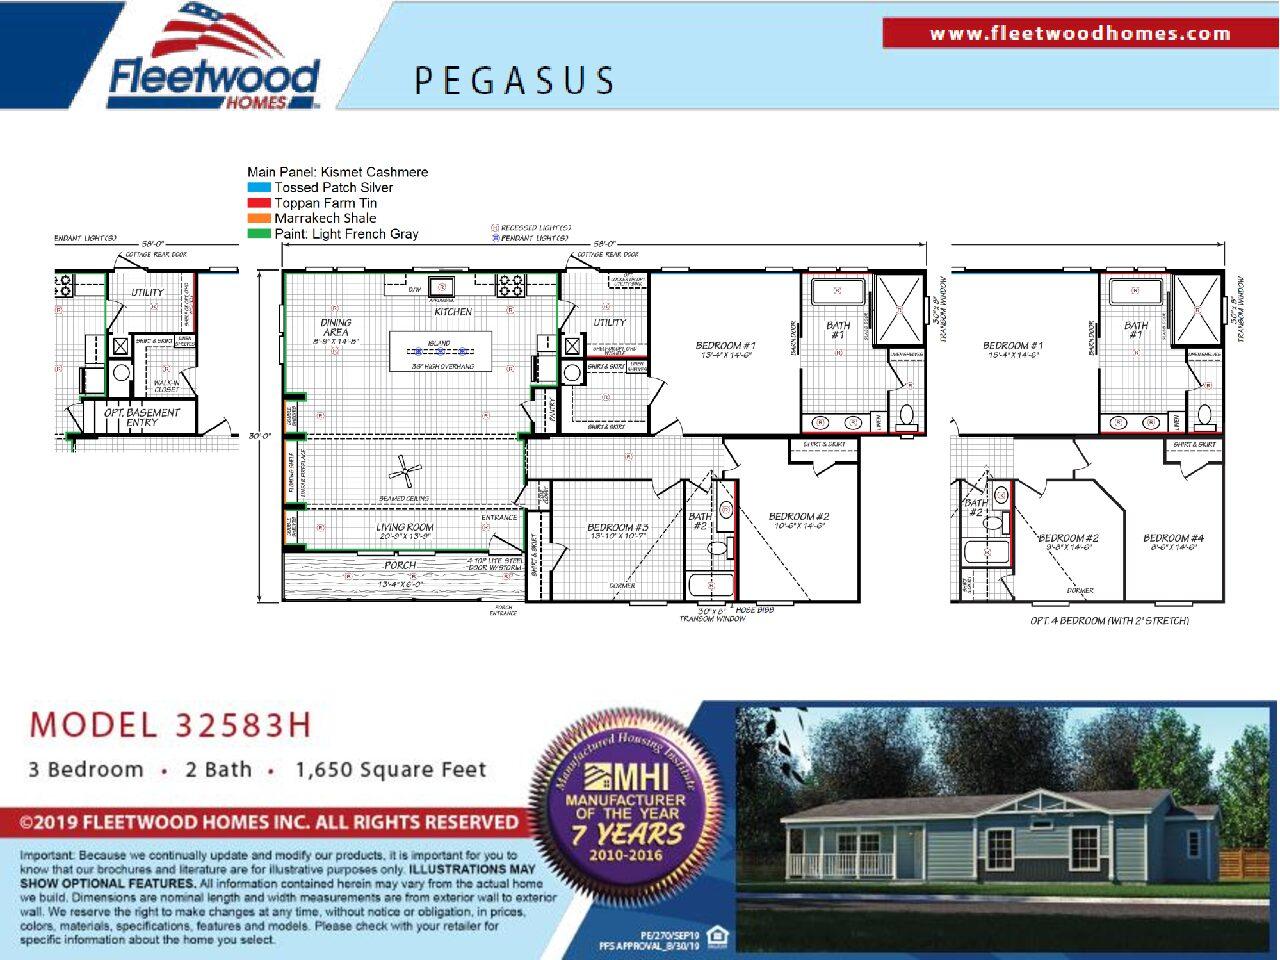 https://properties.myhouselens.com/18035/Pegasus%2032583H%20Farm%20House